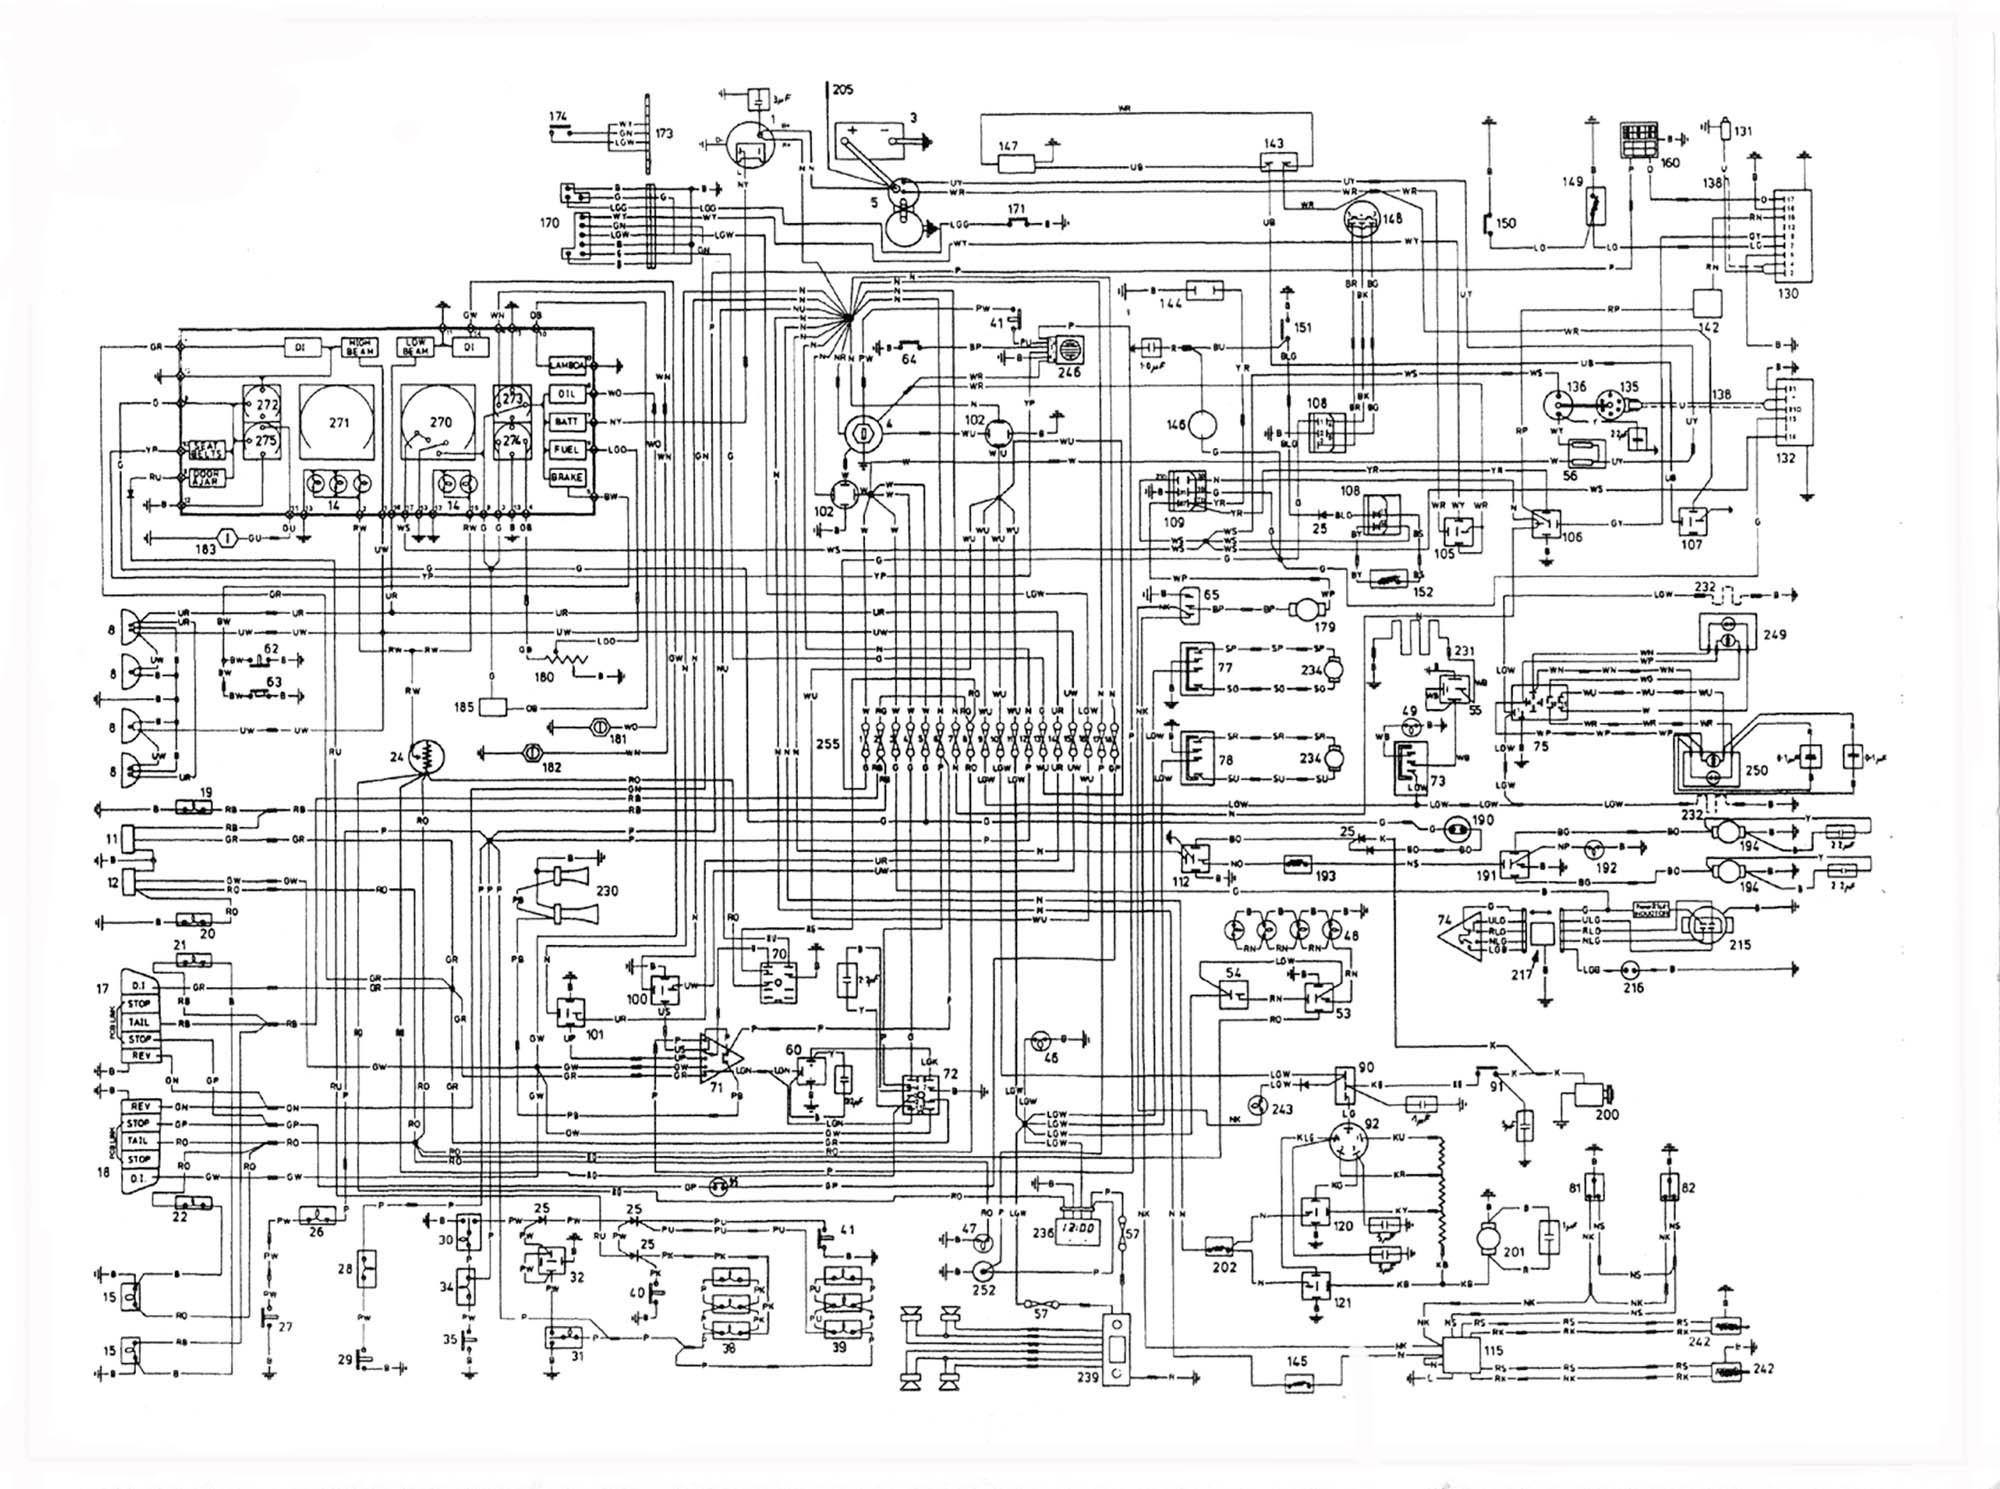 Renault Clio Engine Diagram Awesome Renault Kangoo Wiring Diagram Everything You Need Of Renault Clio Engine Diagram